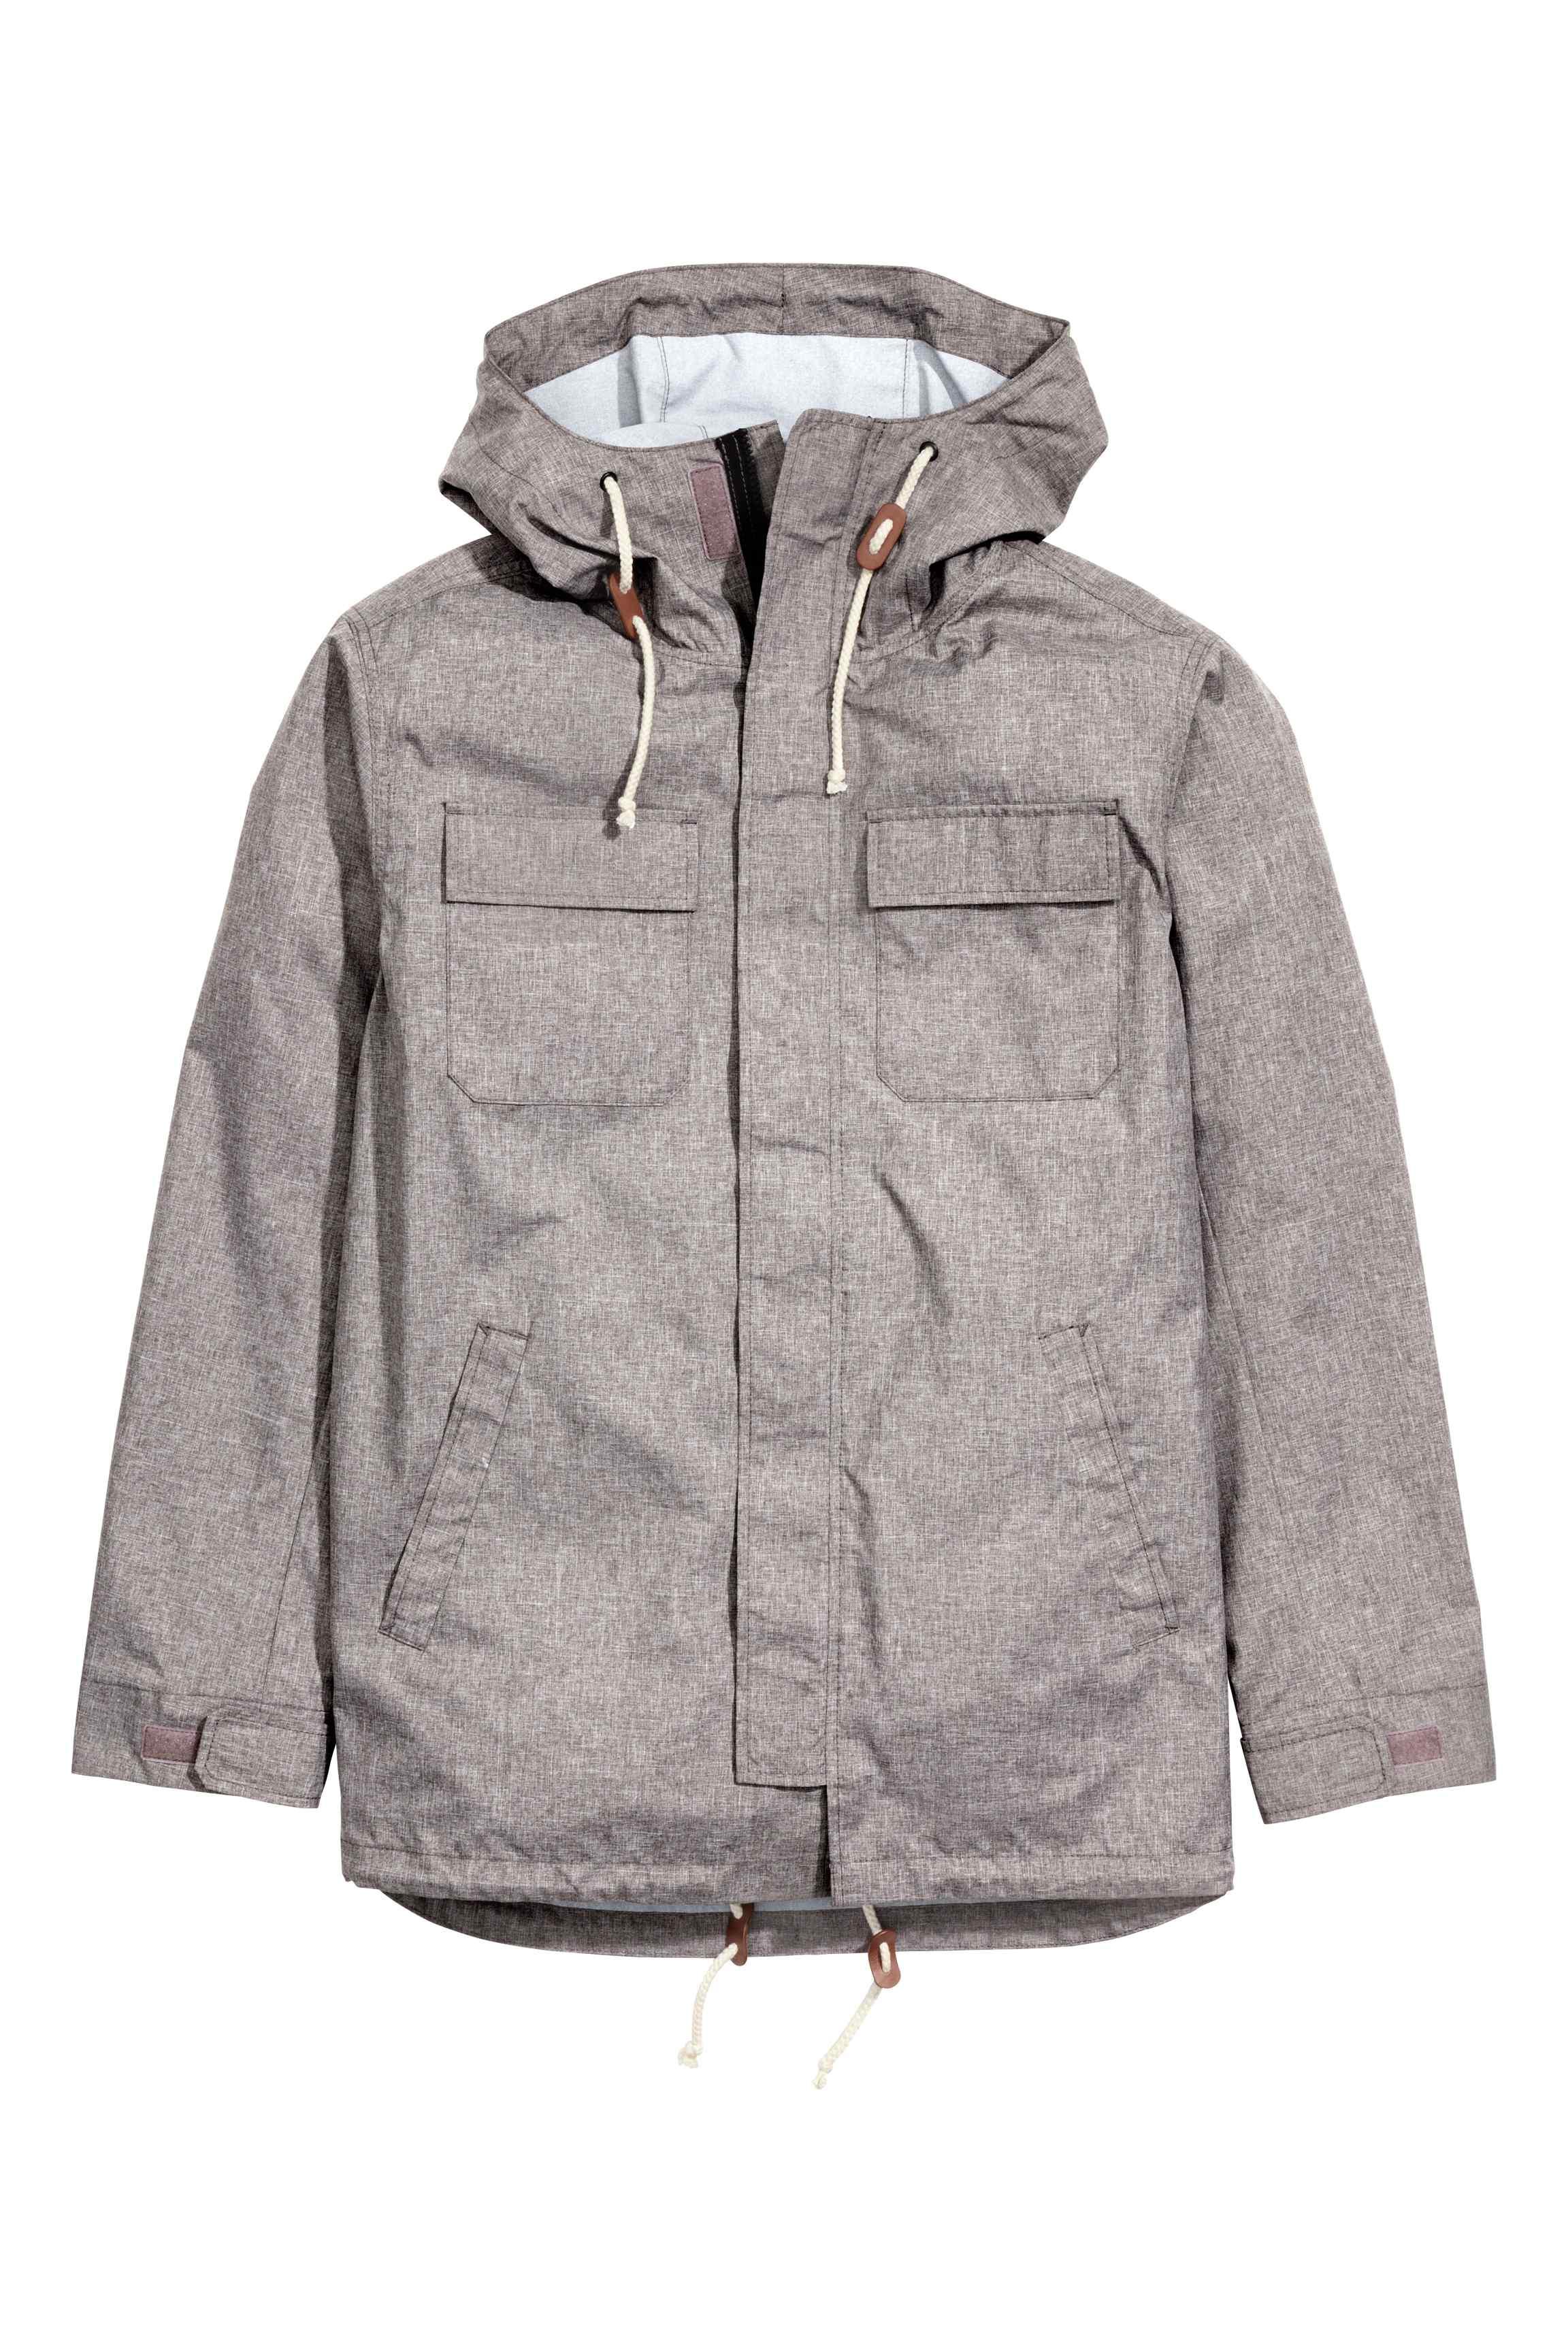 Parka with a hood, £29.99 ( hm.com )